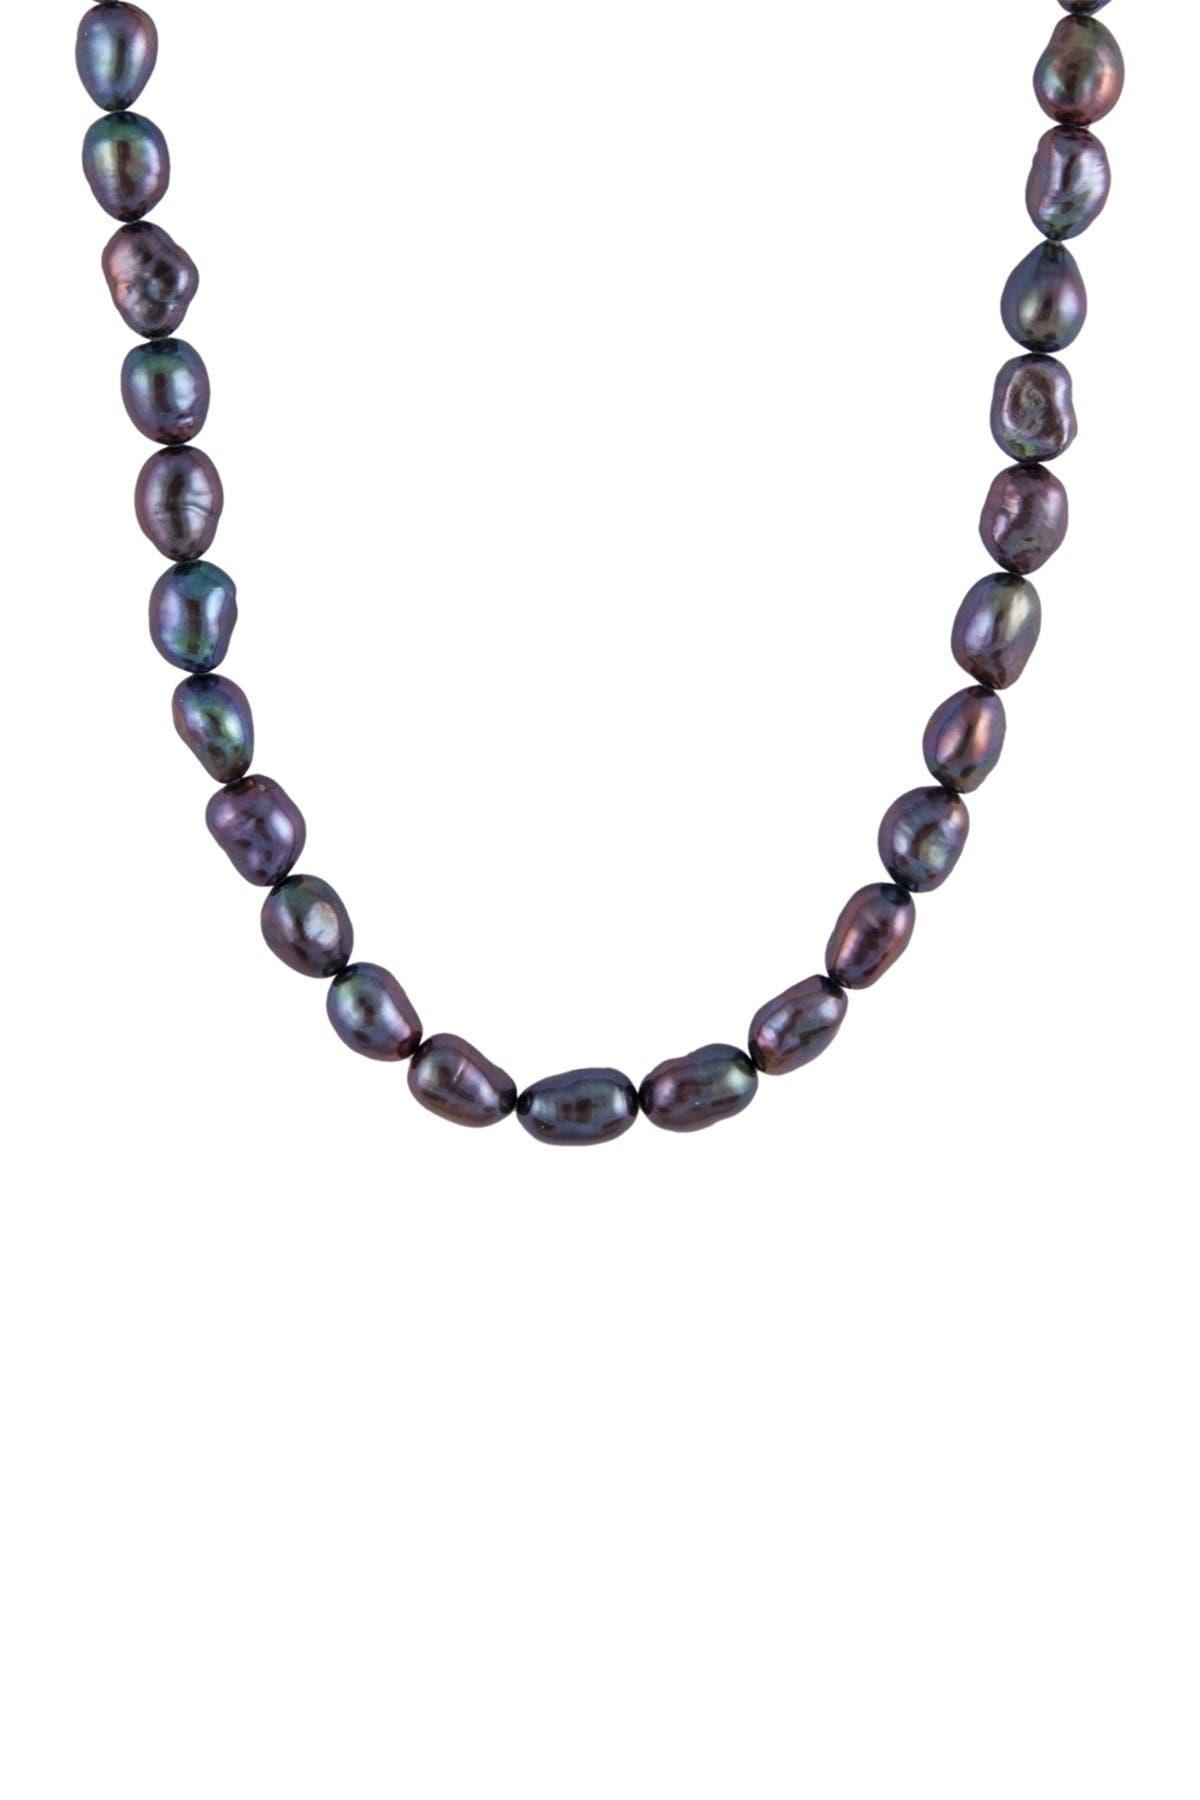 Image of Splendid Pearls Black Pearl Necklace